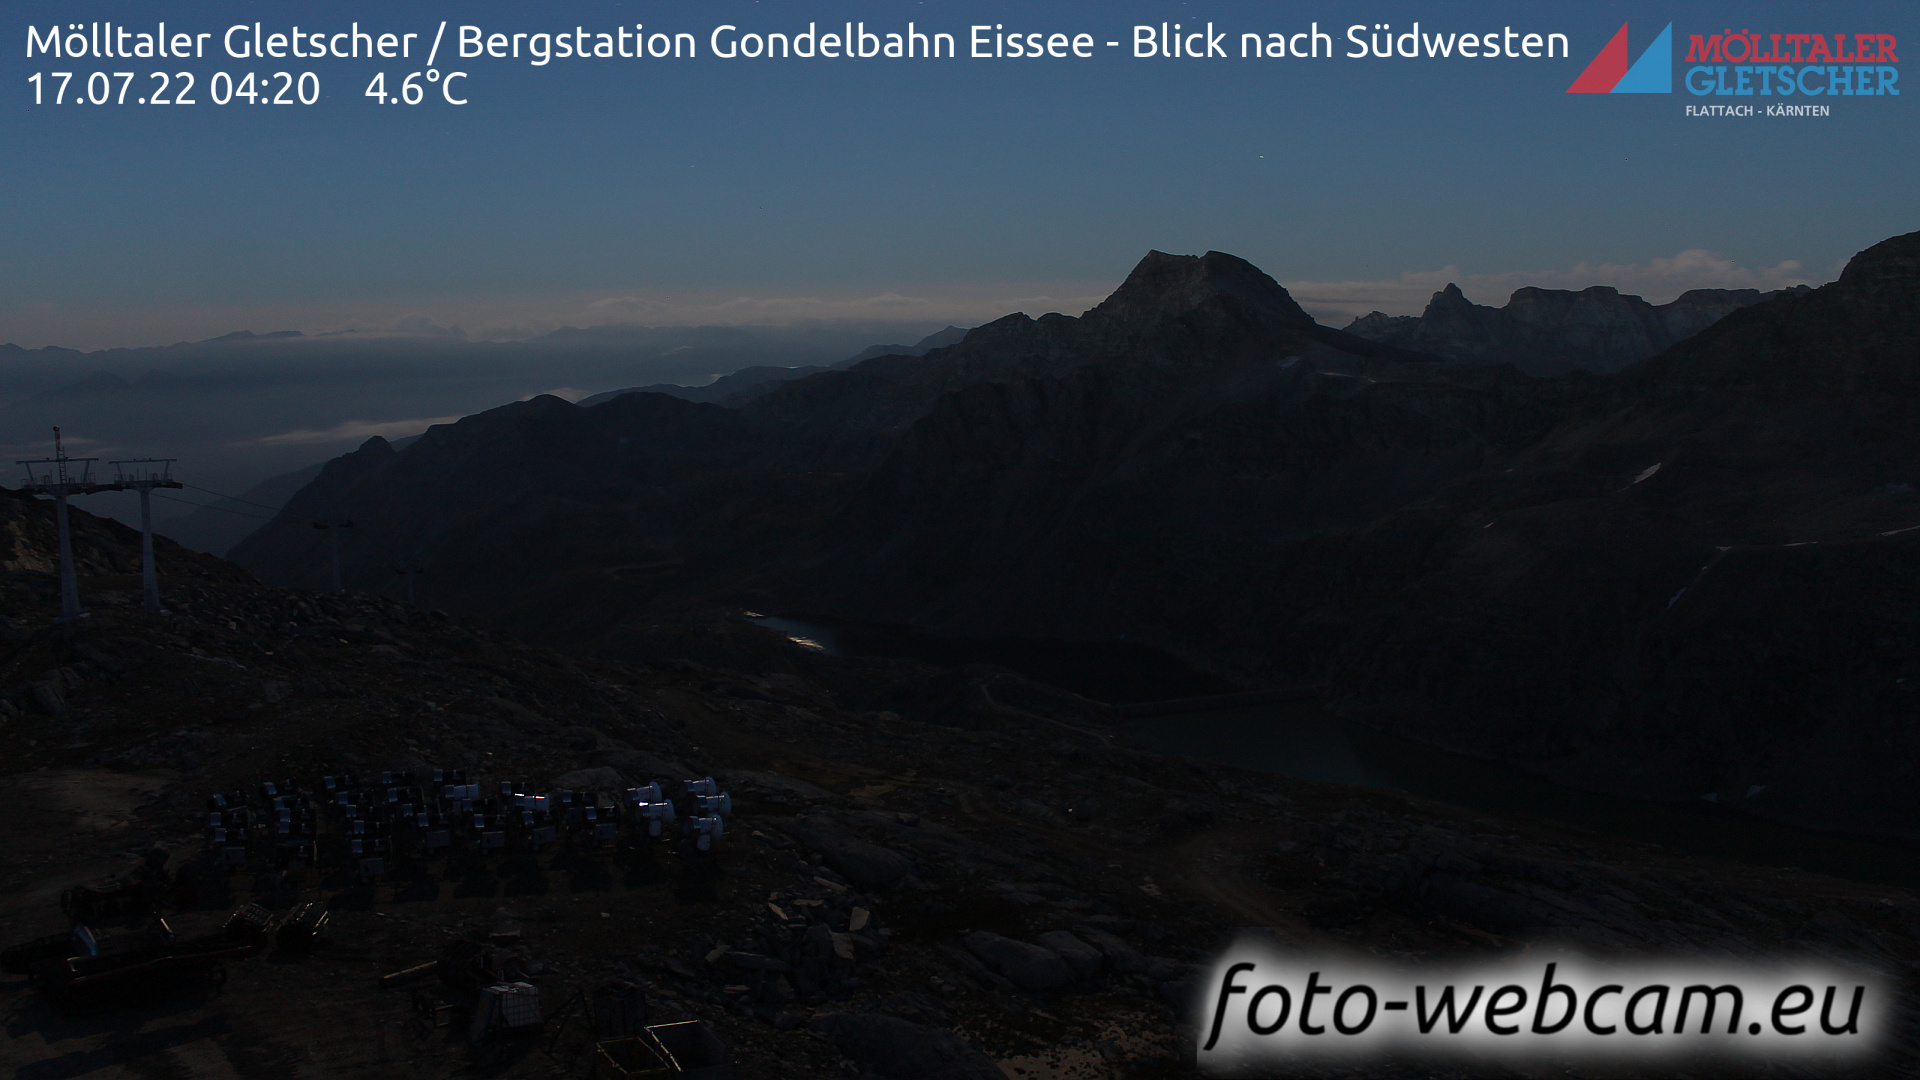 Glacier Mölltal Mon. 04:29